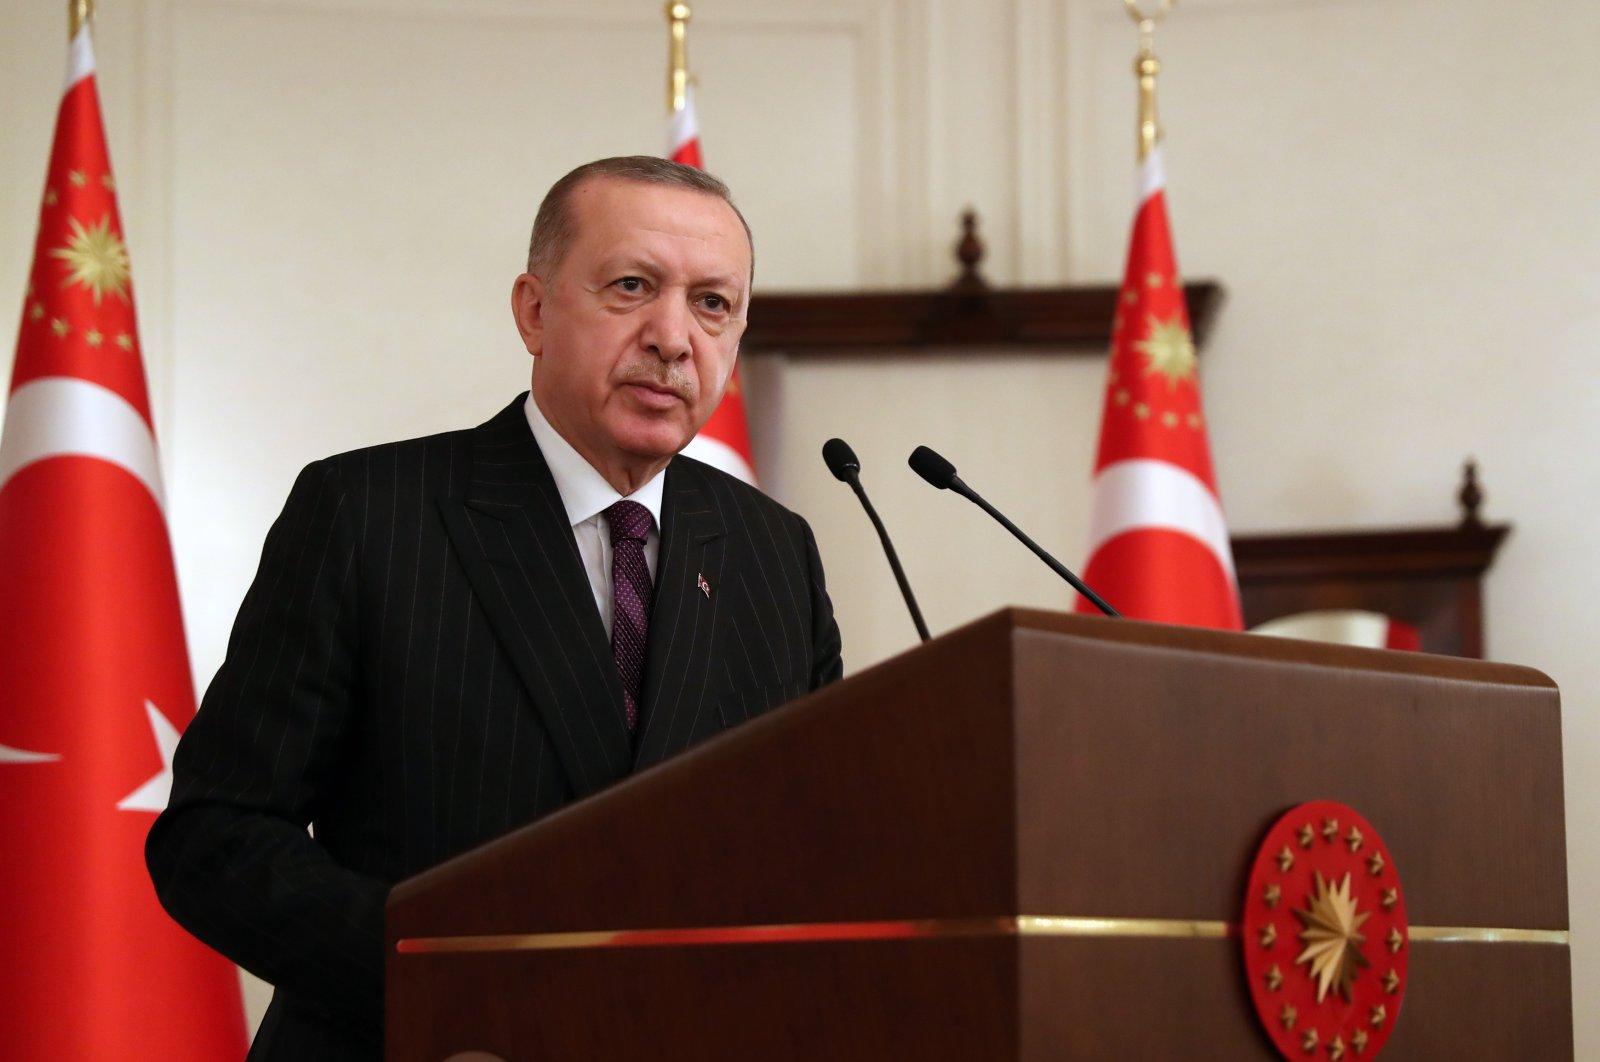 President Recep Tayyip Erdoğan addresses European Union ambassadors in the capital Ankara, Turkey, Jan. 12, 2021. (AA)